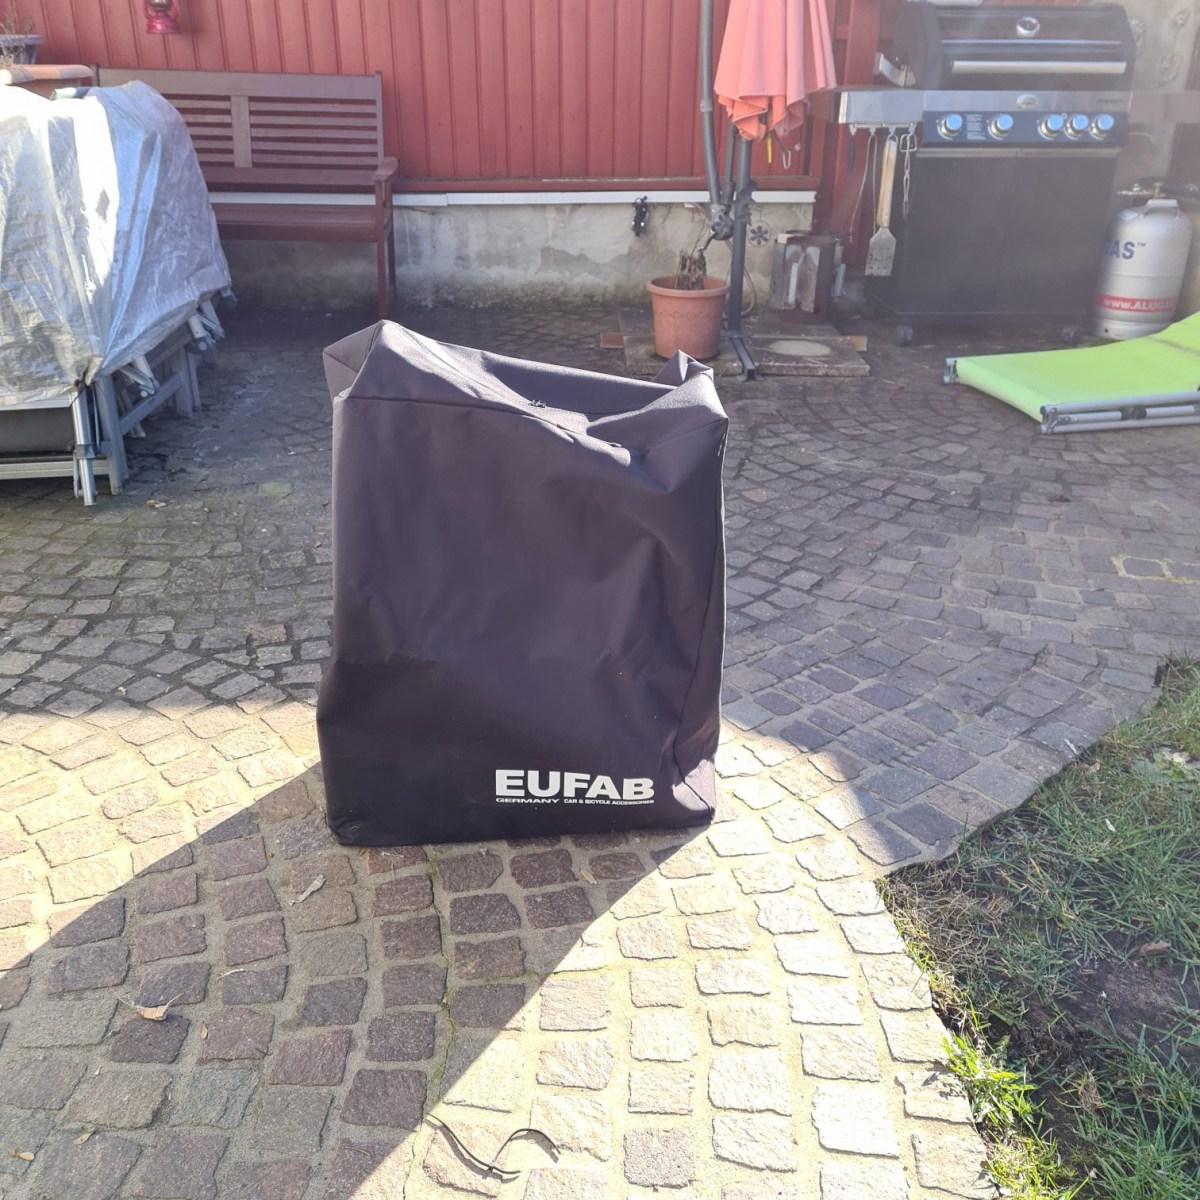 eufab_1